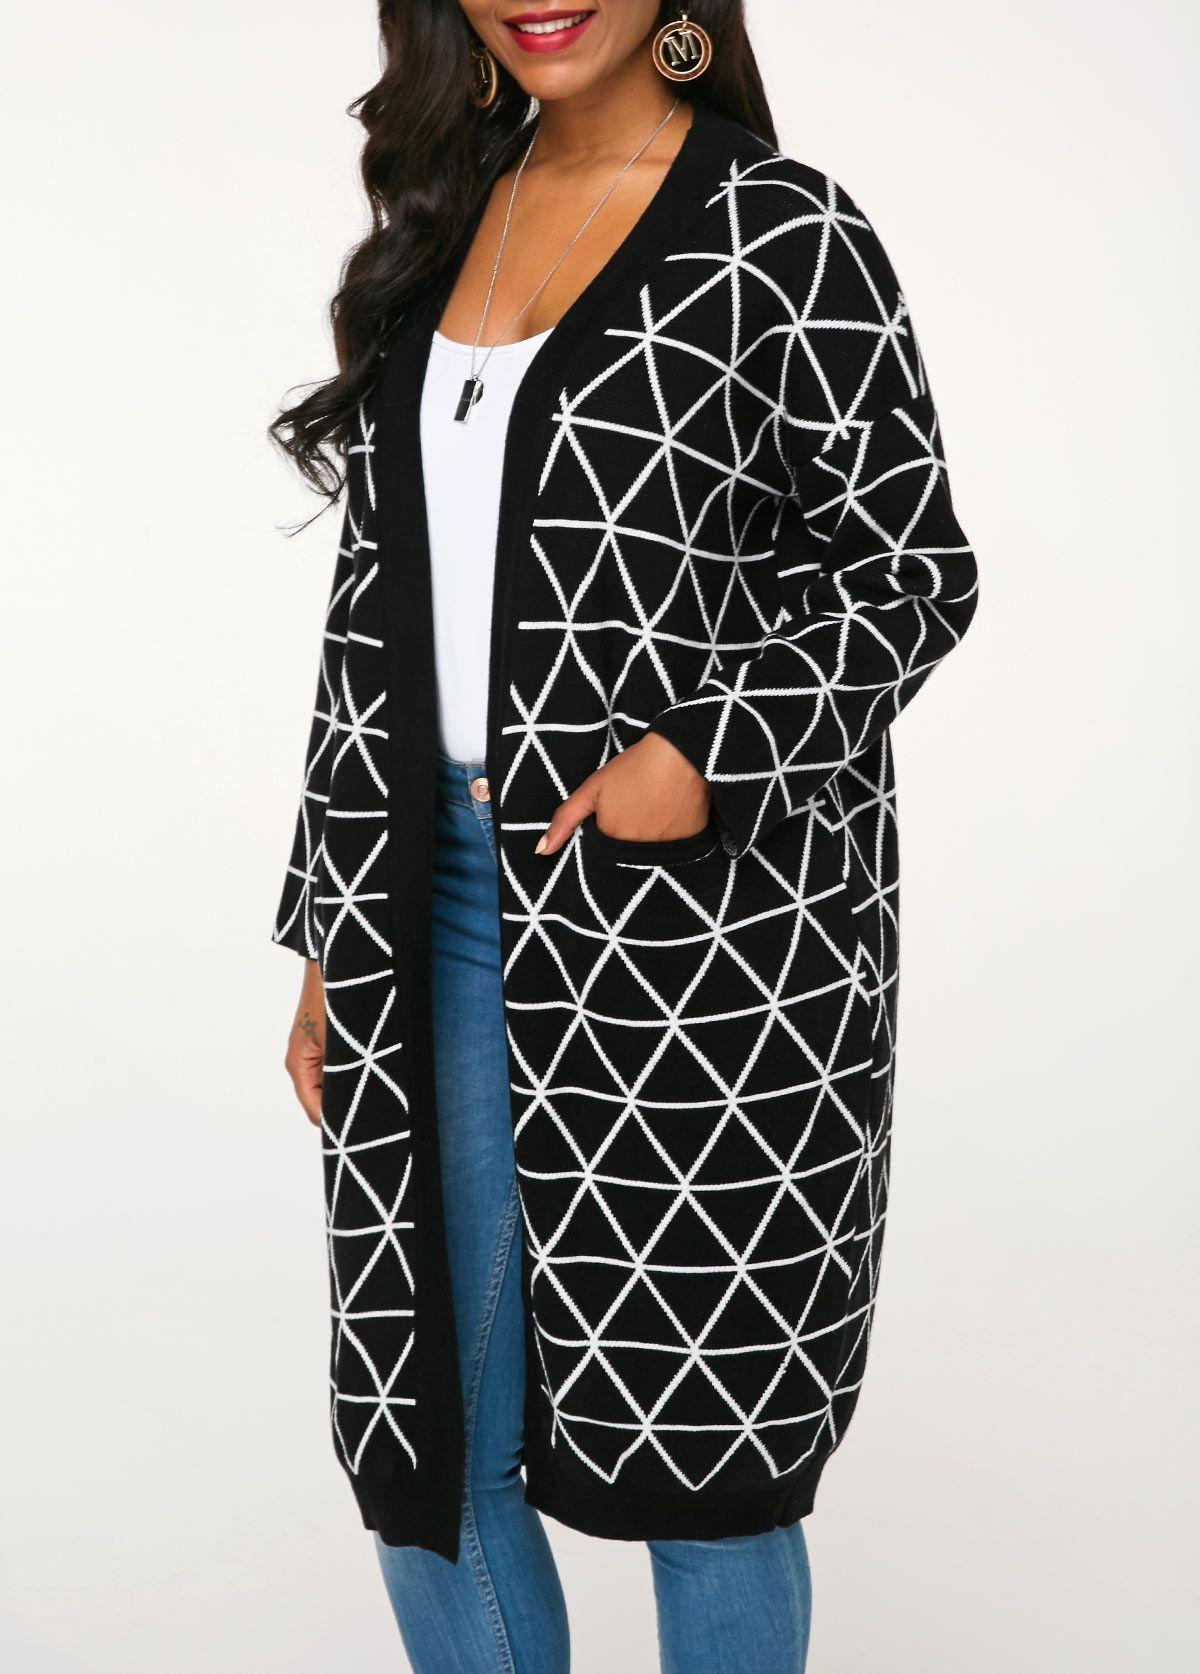 Long Sleeve Black Geometric Pattern Knitting Cardigan